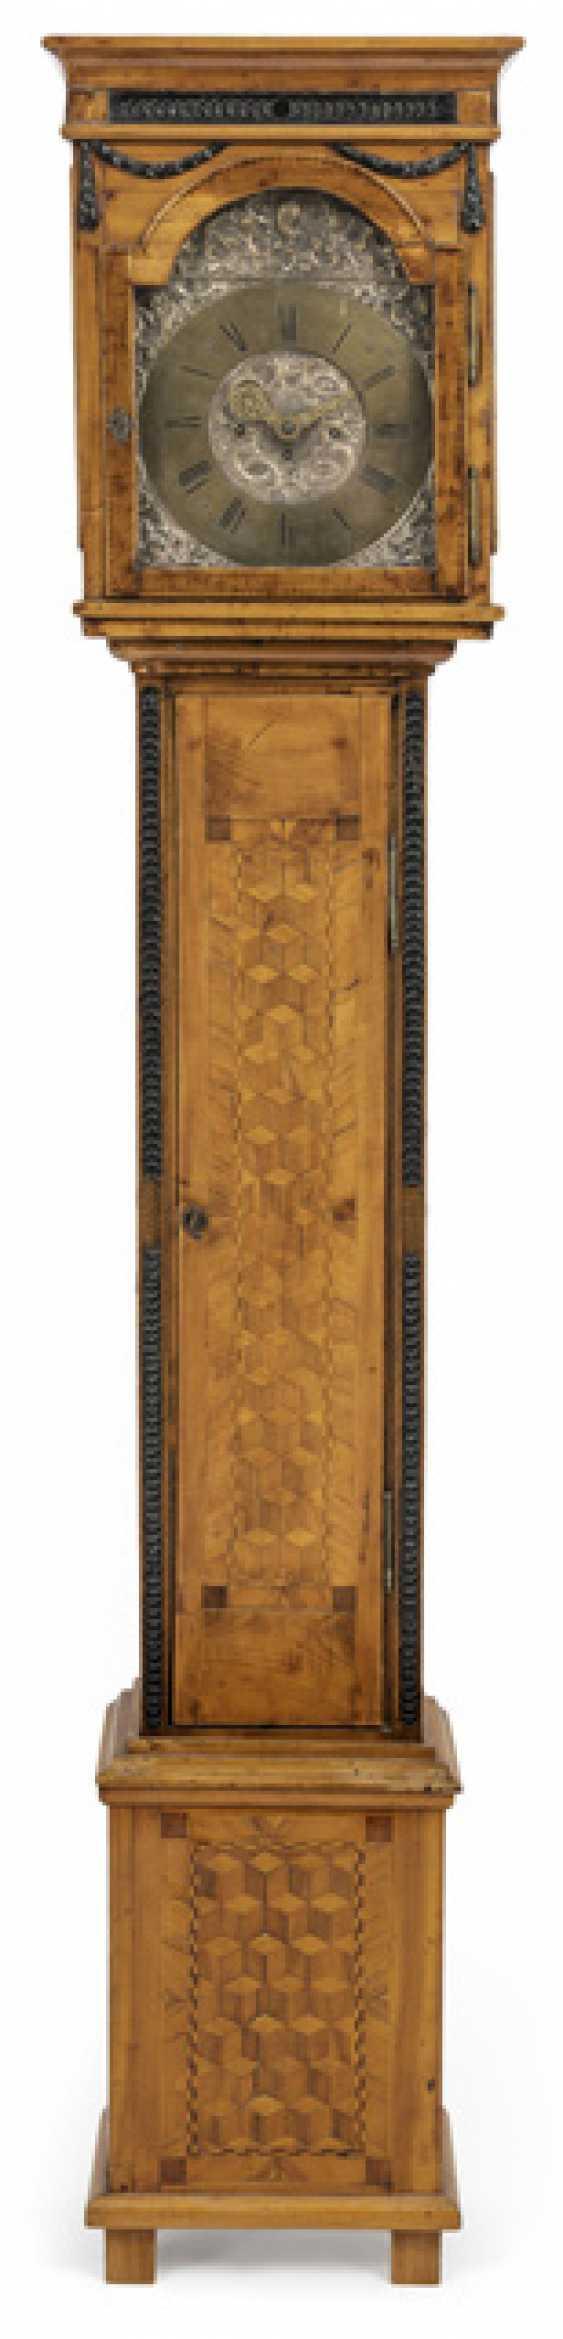 Louis XVI grandfather clock. Name Franc Anton Called in Passau, Germany, around 1780 - photo 1